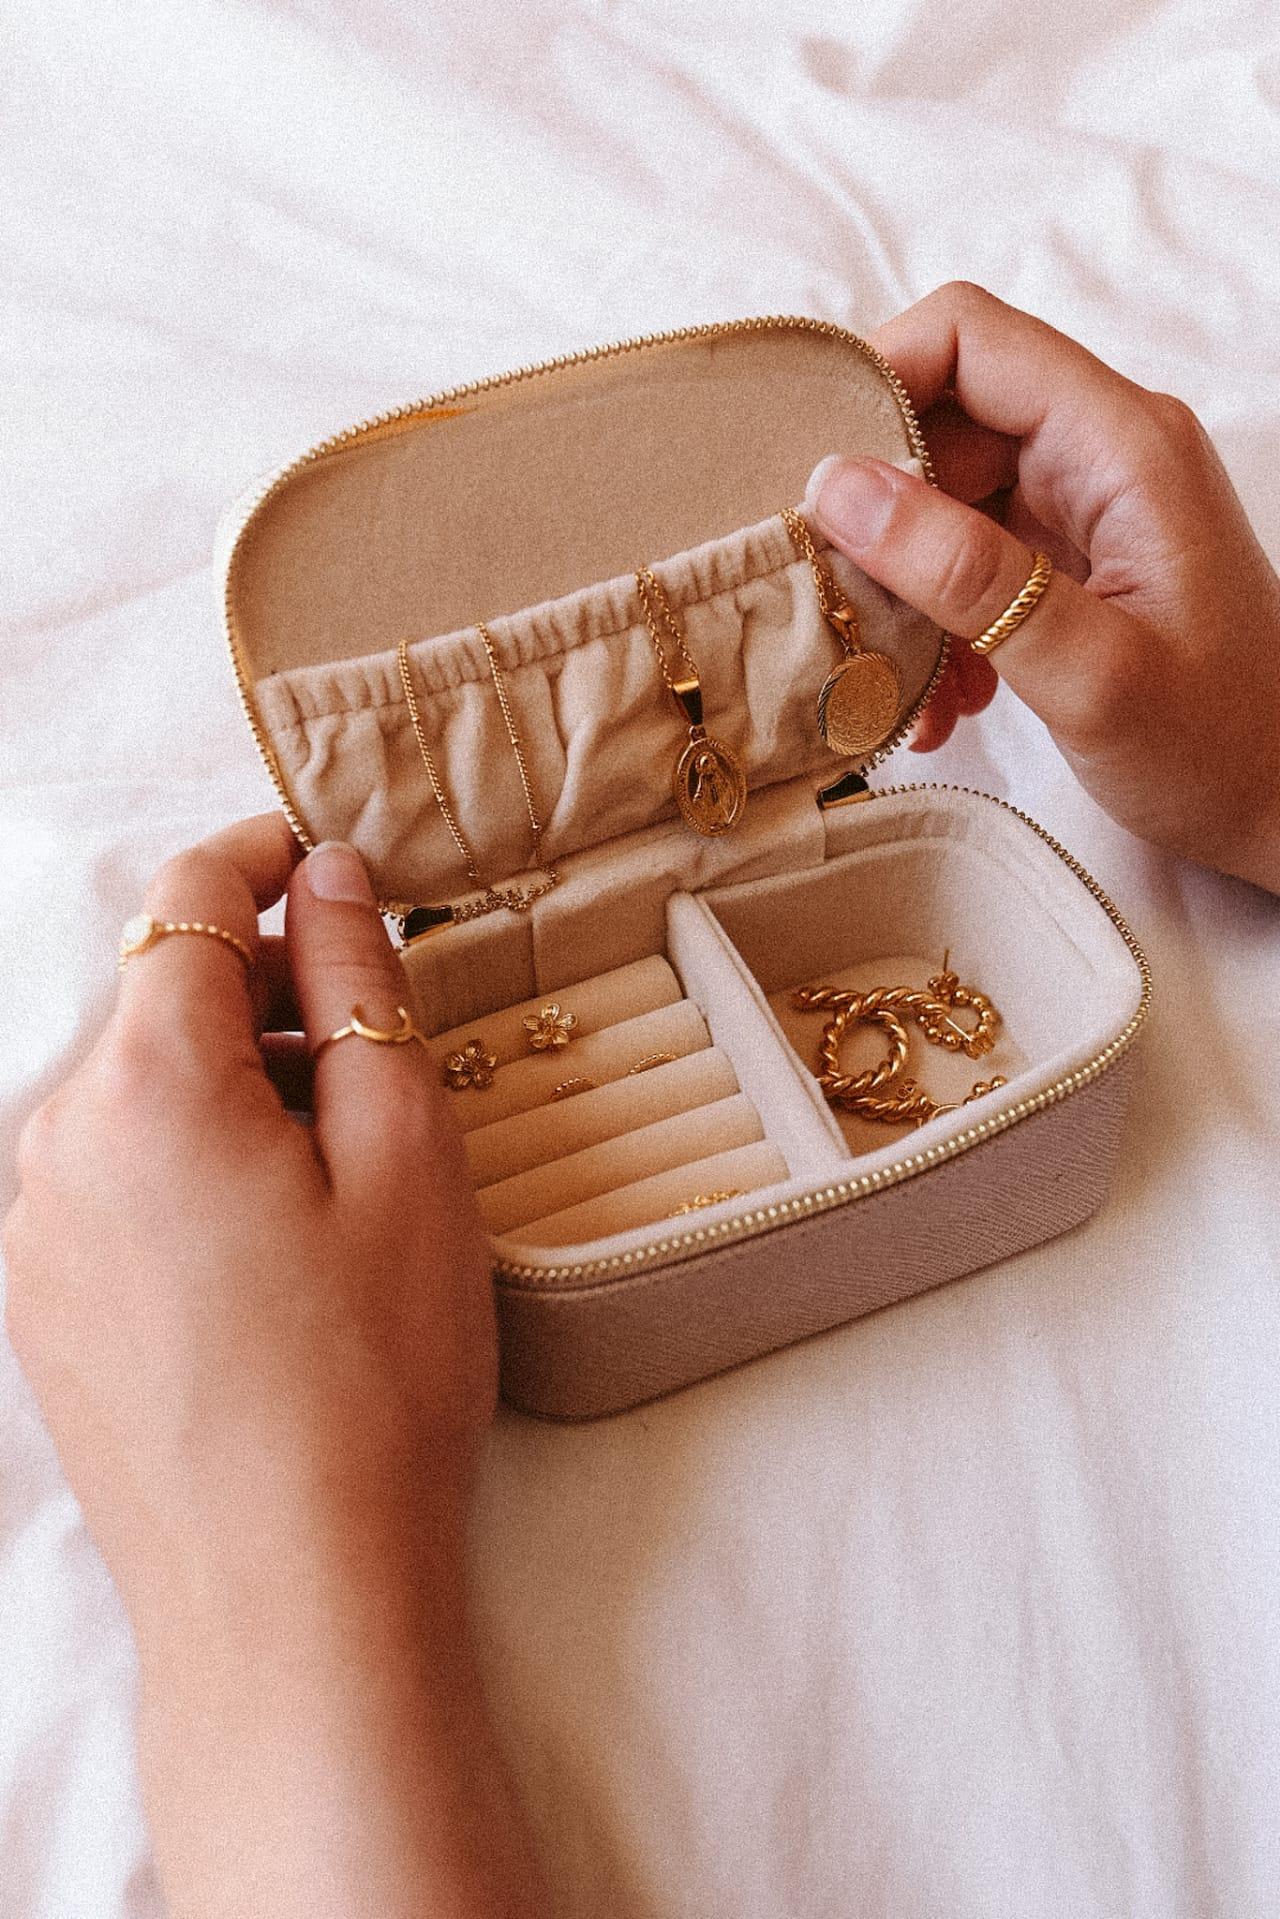 Jewelry Case - Large